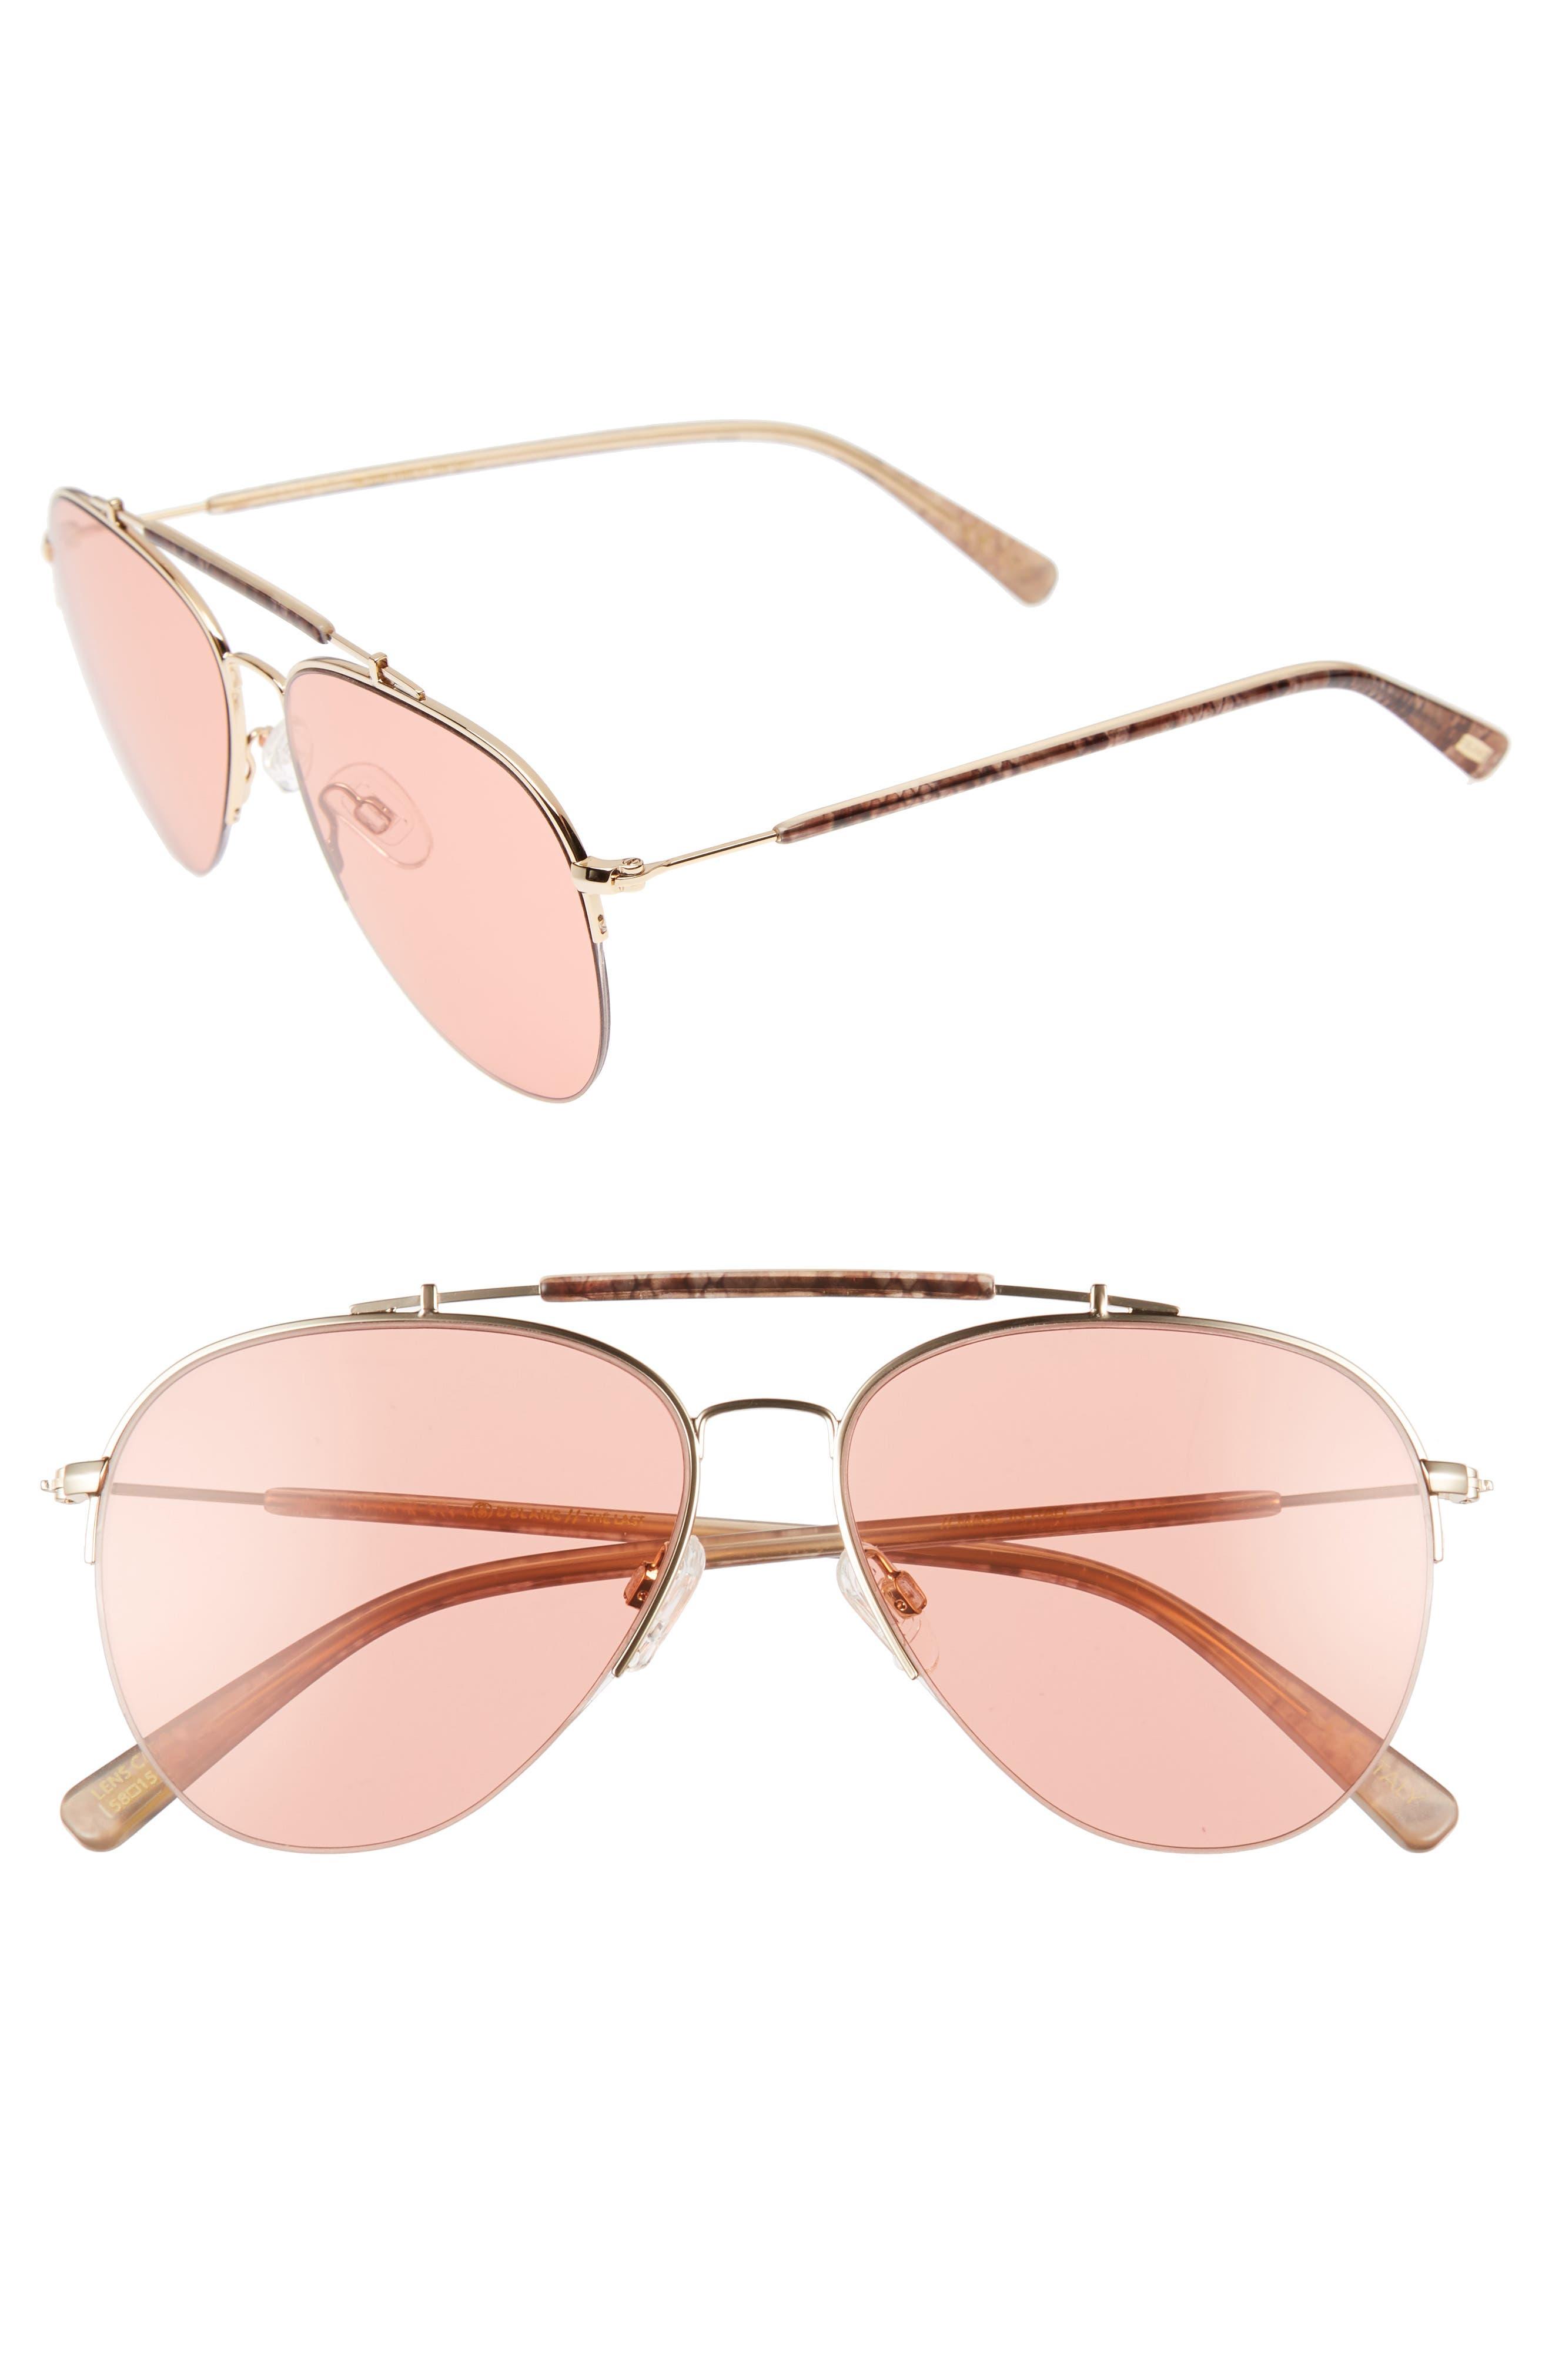 D'BLANC x Amuse Society The Last 58mm Aviator Sunglasses,                         Main,                         color, Rattlesnake/ Persimmon